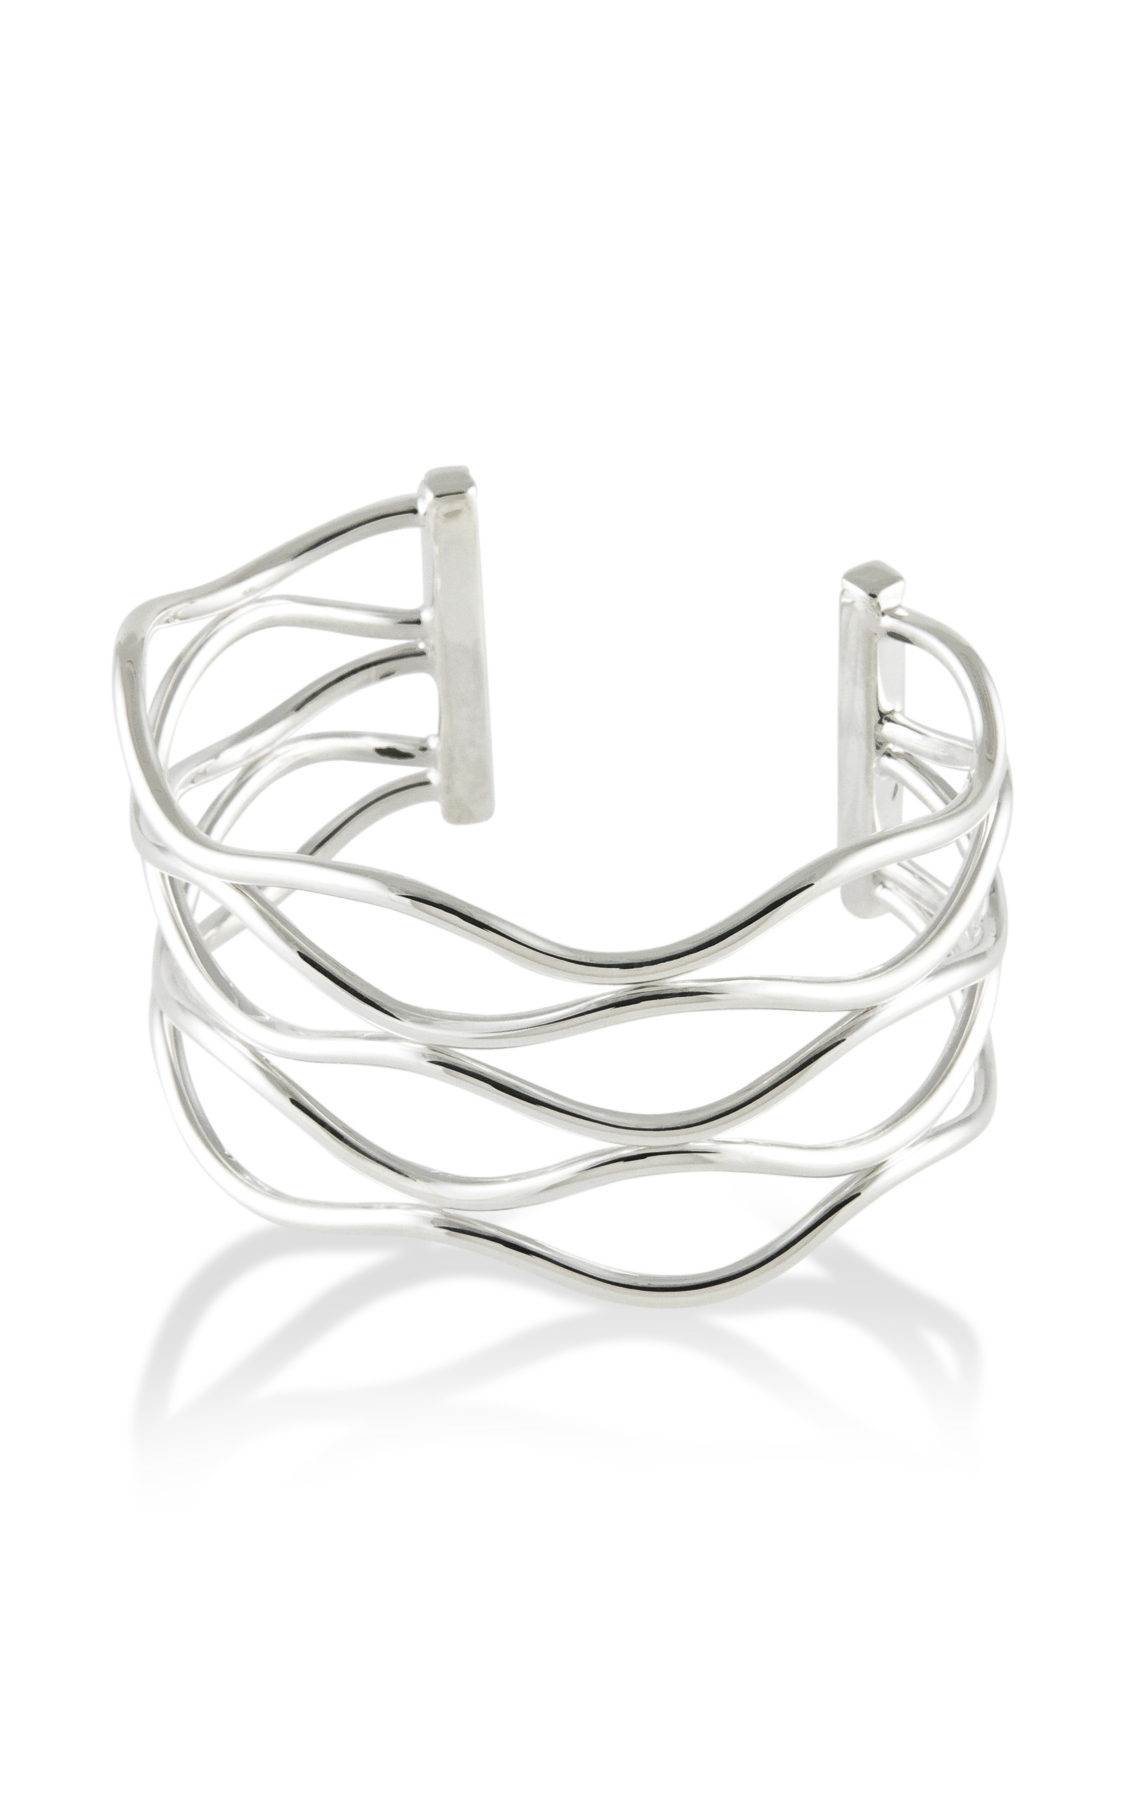 Zina Wired Bracelet A1735 product image